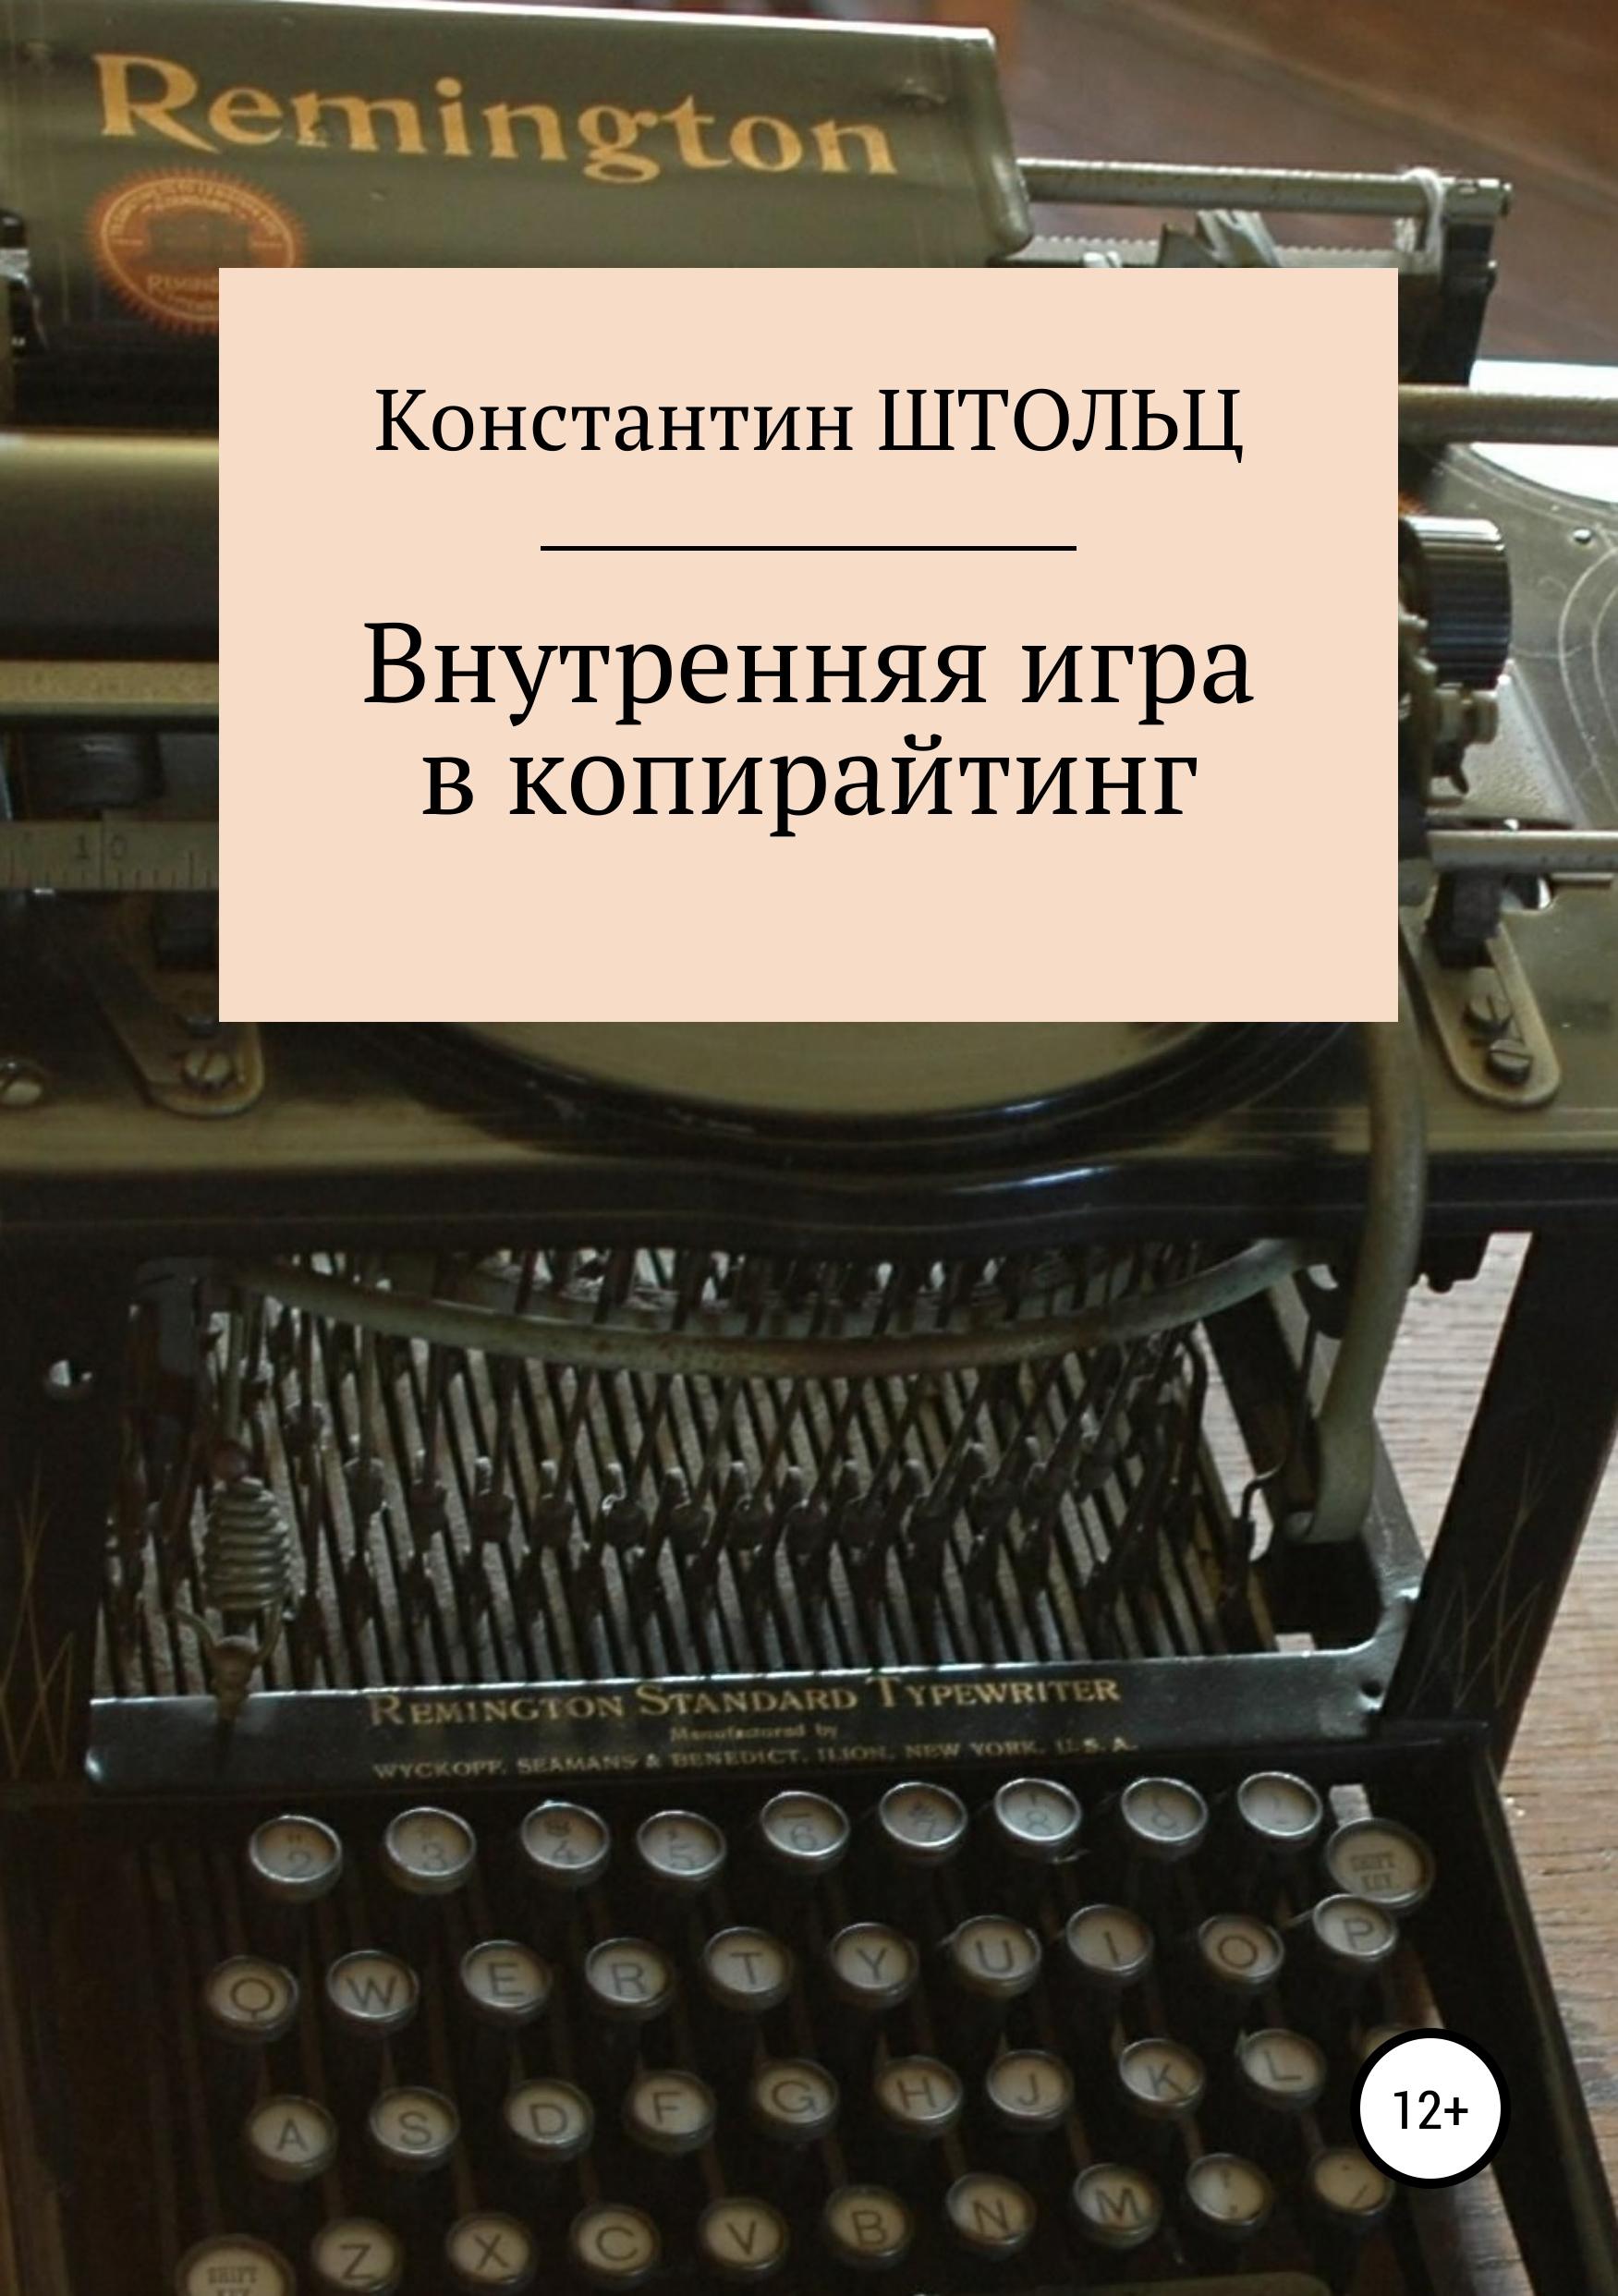 Обложка книги. Автор - Константин Штольц